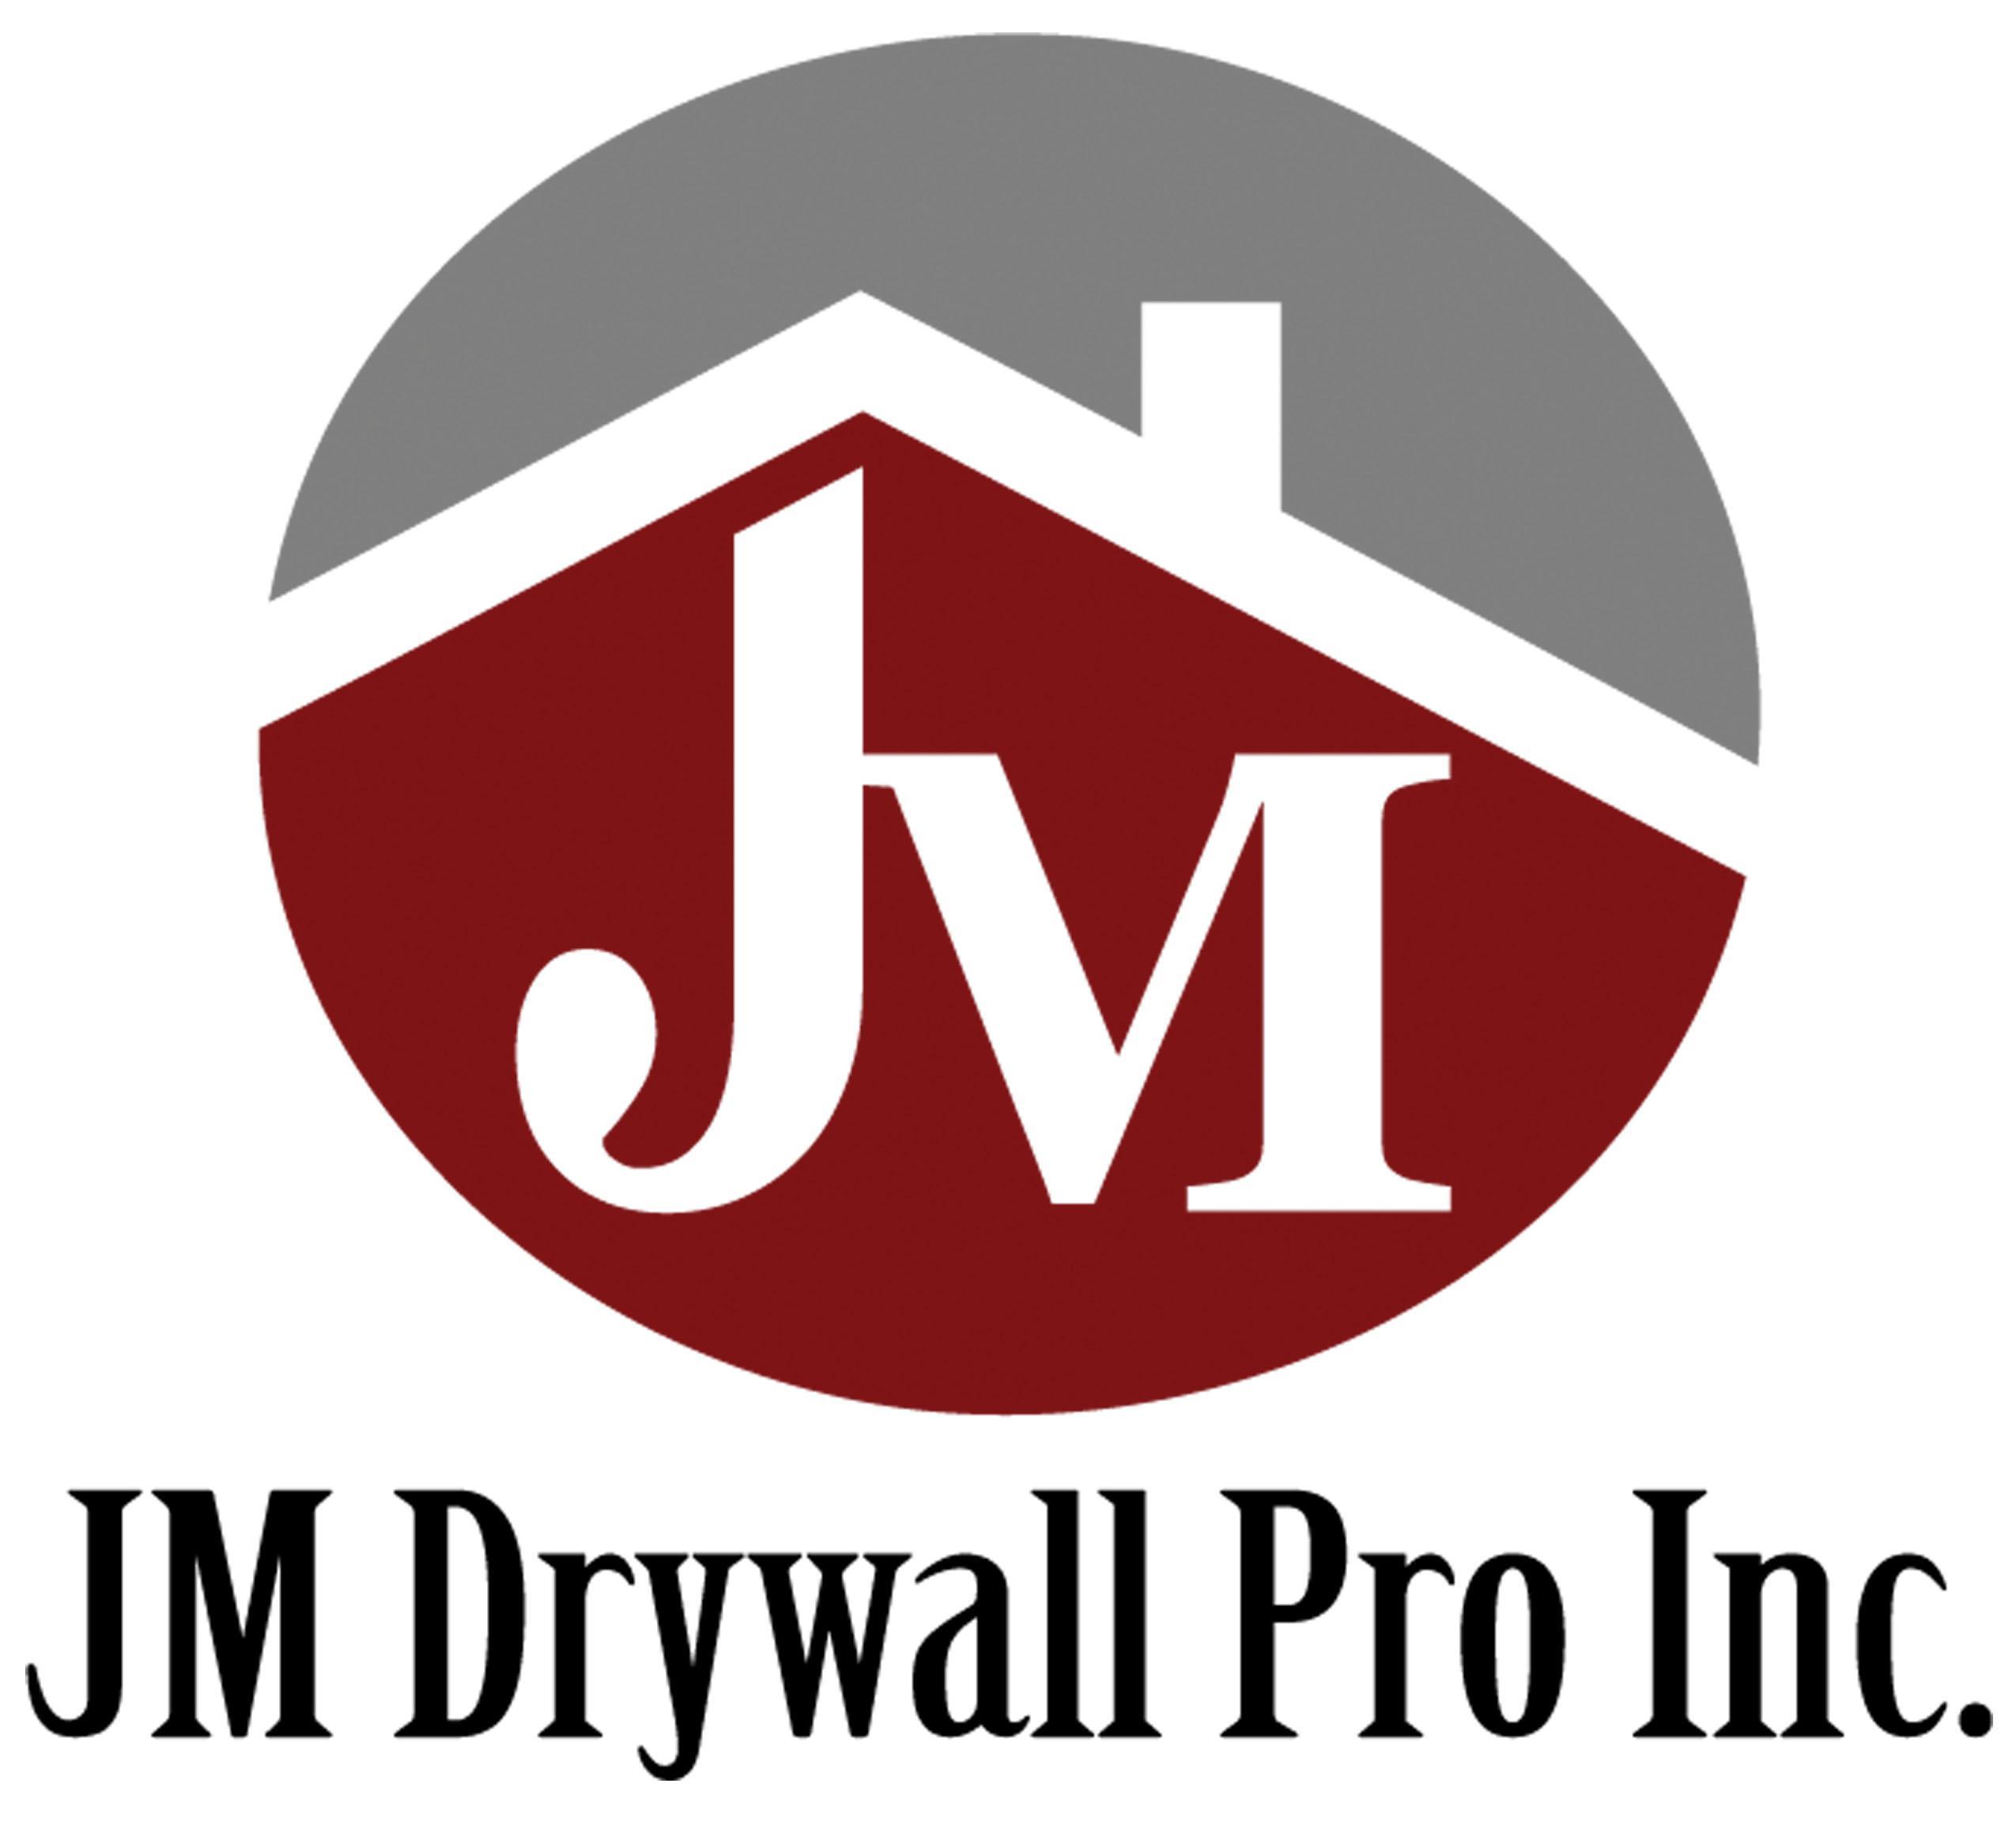 JM Drywall Pro, Inc.